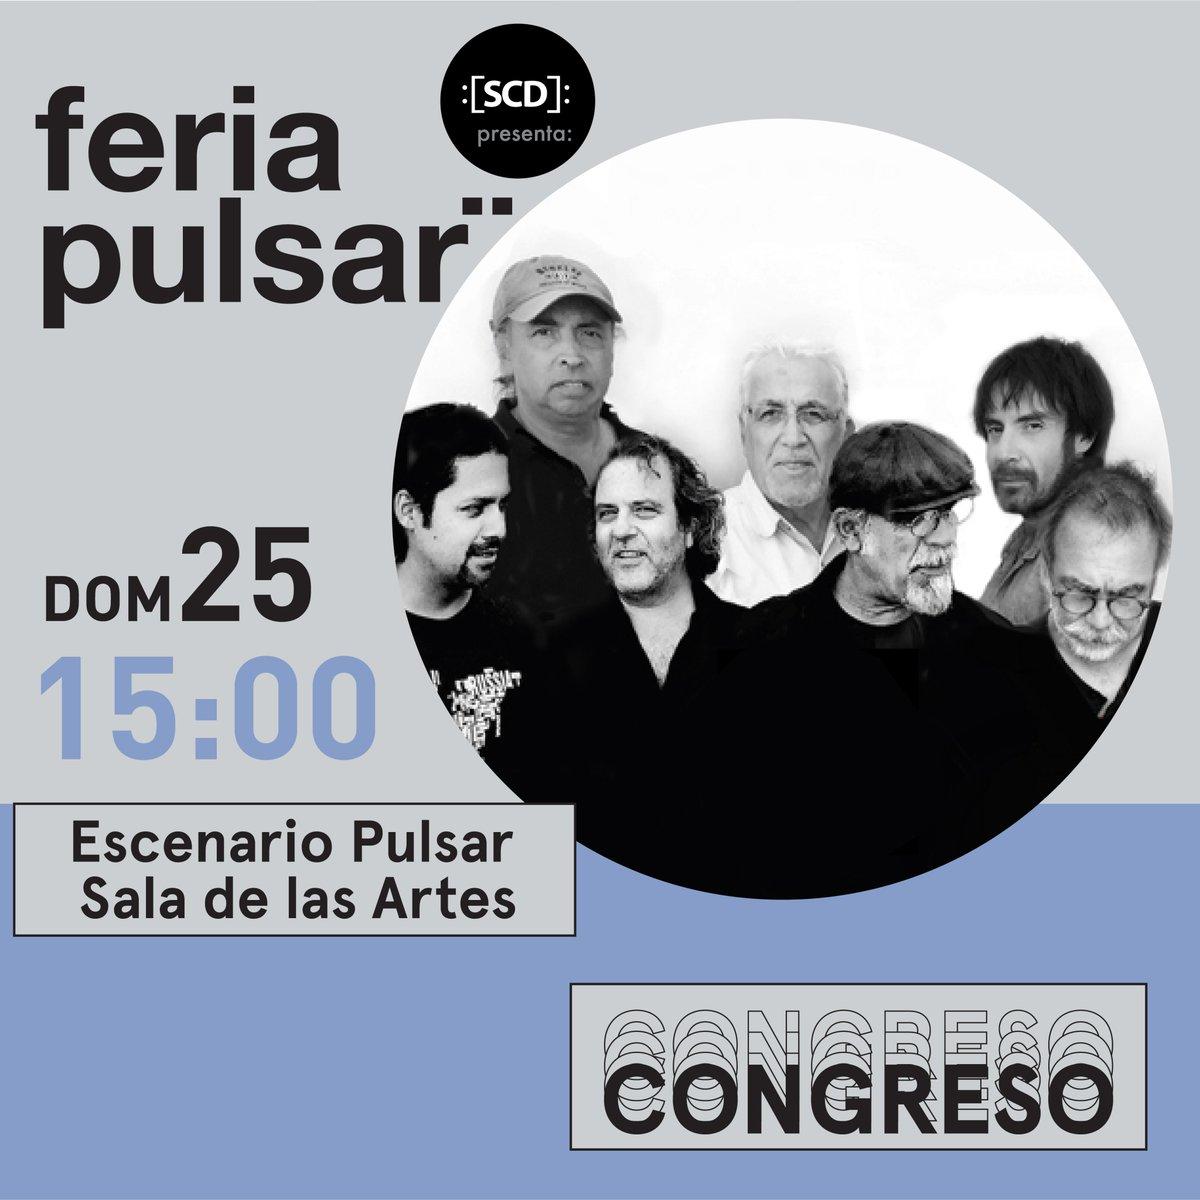 test Twitter Media - ¡Queda una semana para #FeriaPulsar2018! Revisa el programa en https://t.co/1ztmFR8VGT y compra tus entradas en https://t.co/dBVS2Jw7qr 😉 https://t.co/fPA9Y7nEMp